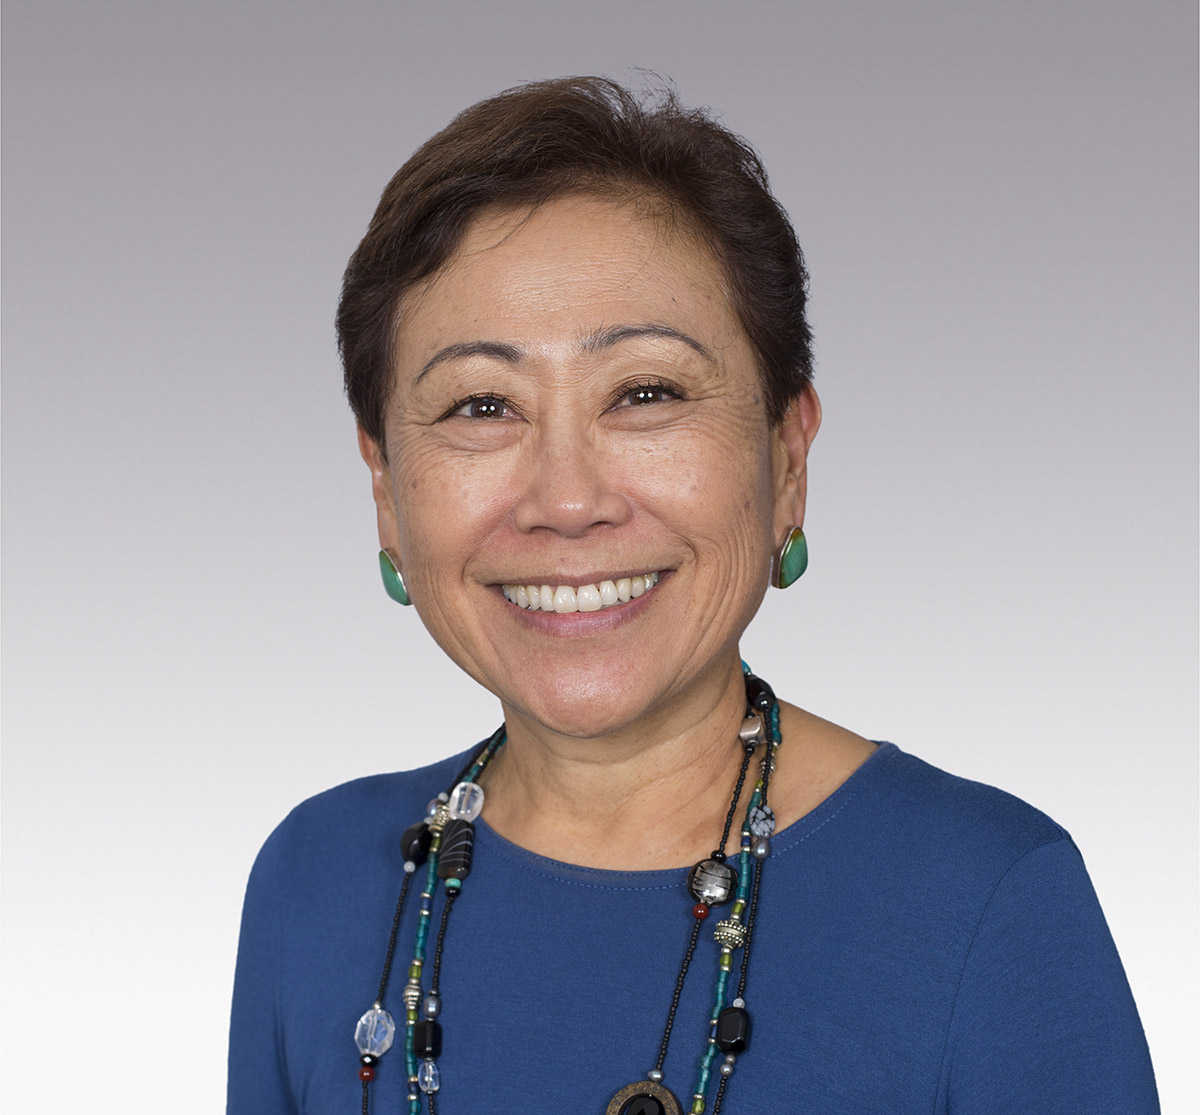 Kathryn Matayoshi